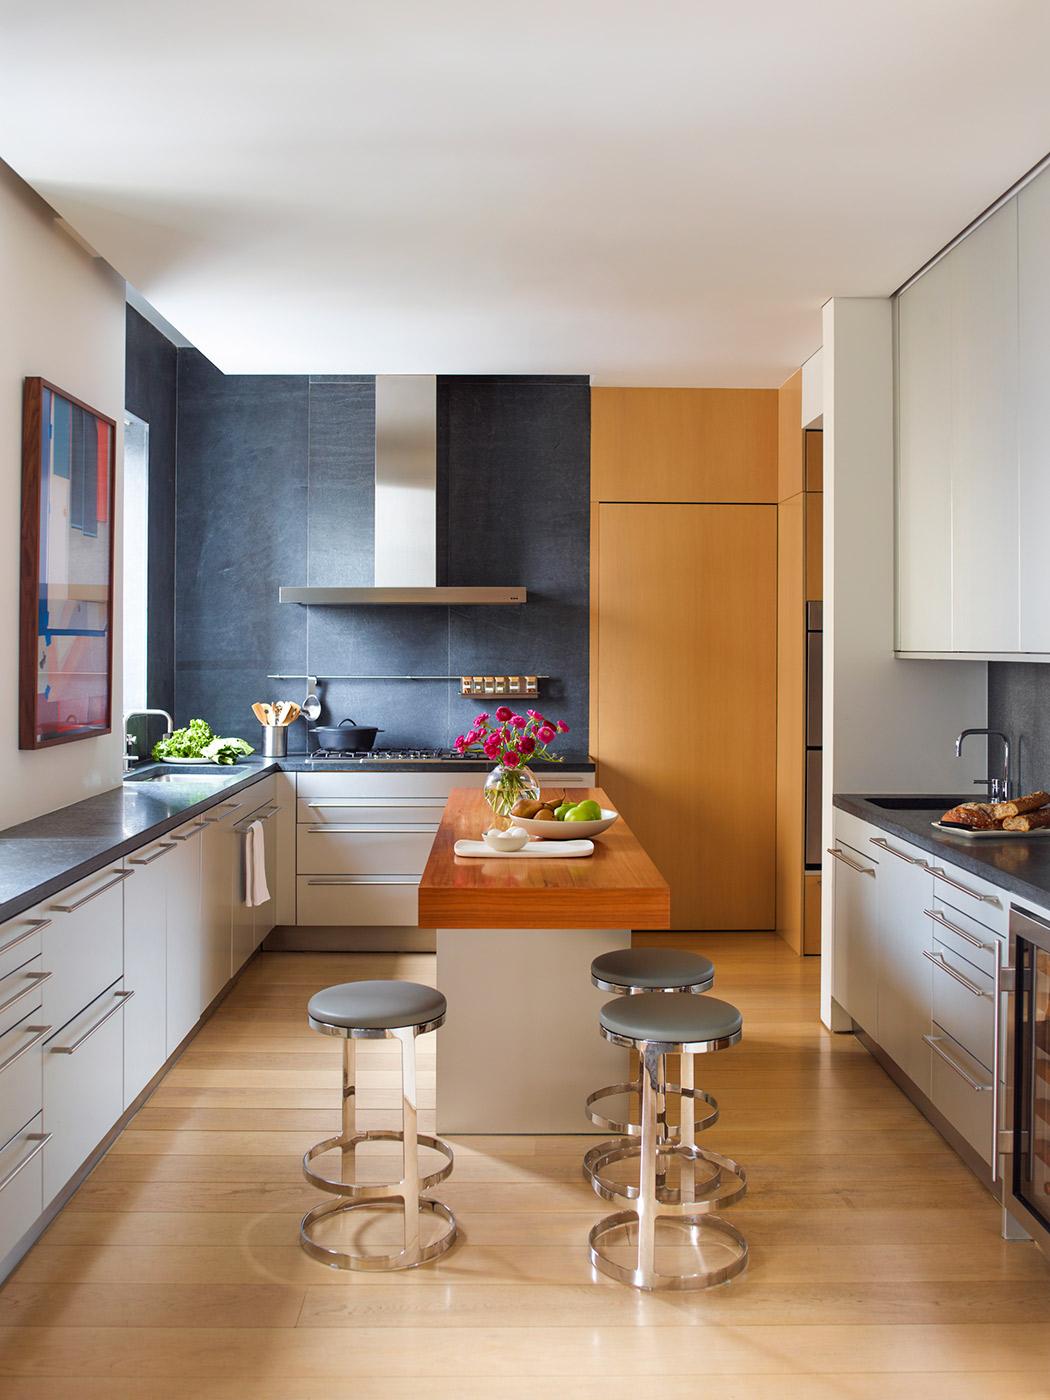 East 79th Street Apartment, New York